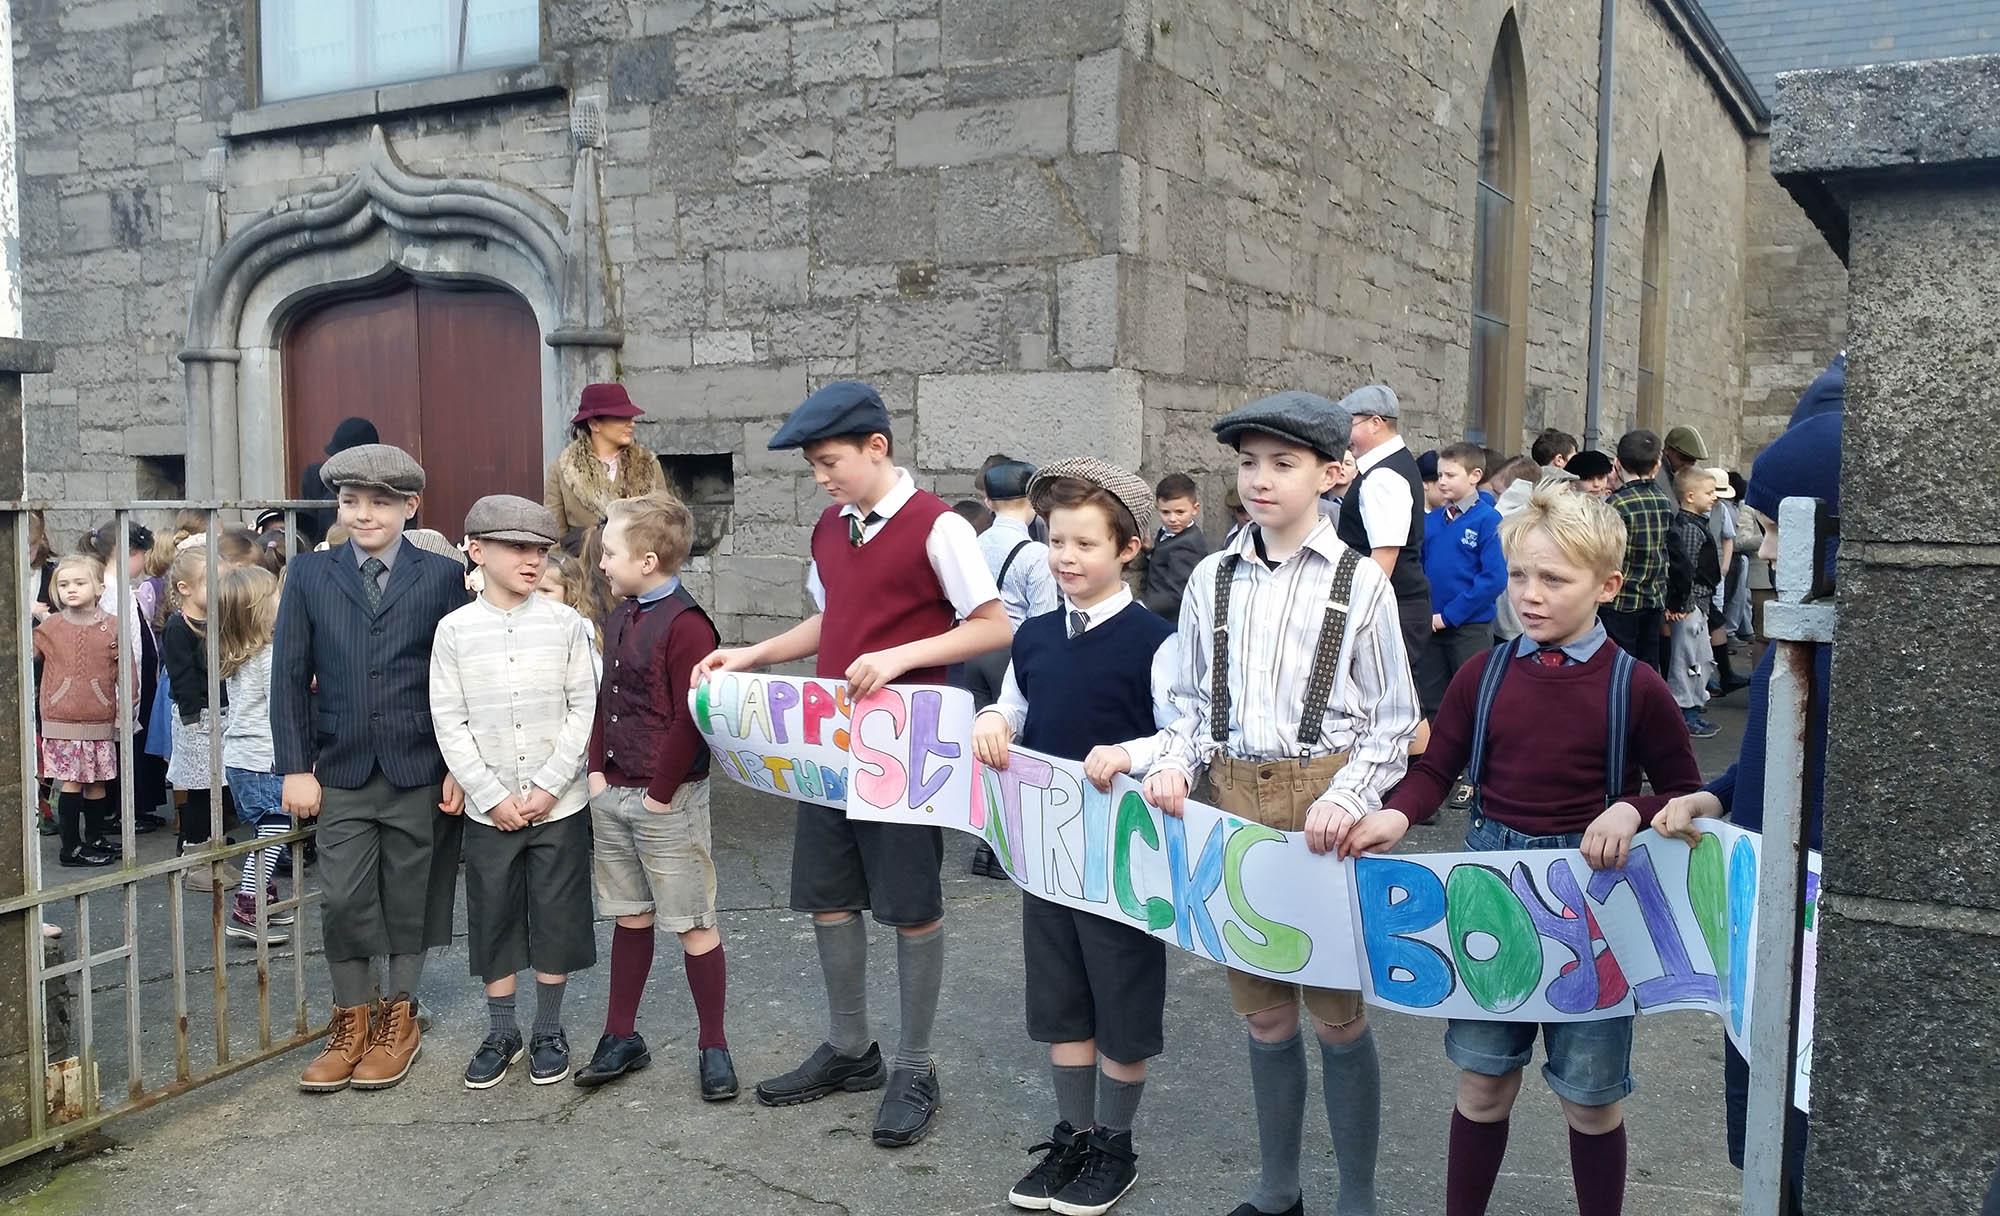 St Patrick's School 100 Year Anniversary